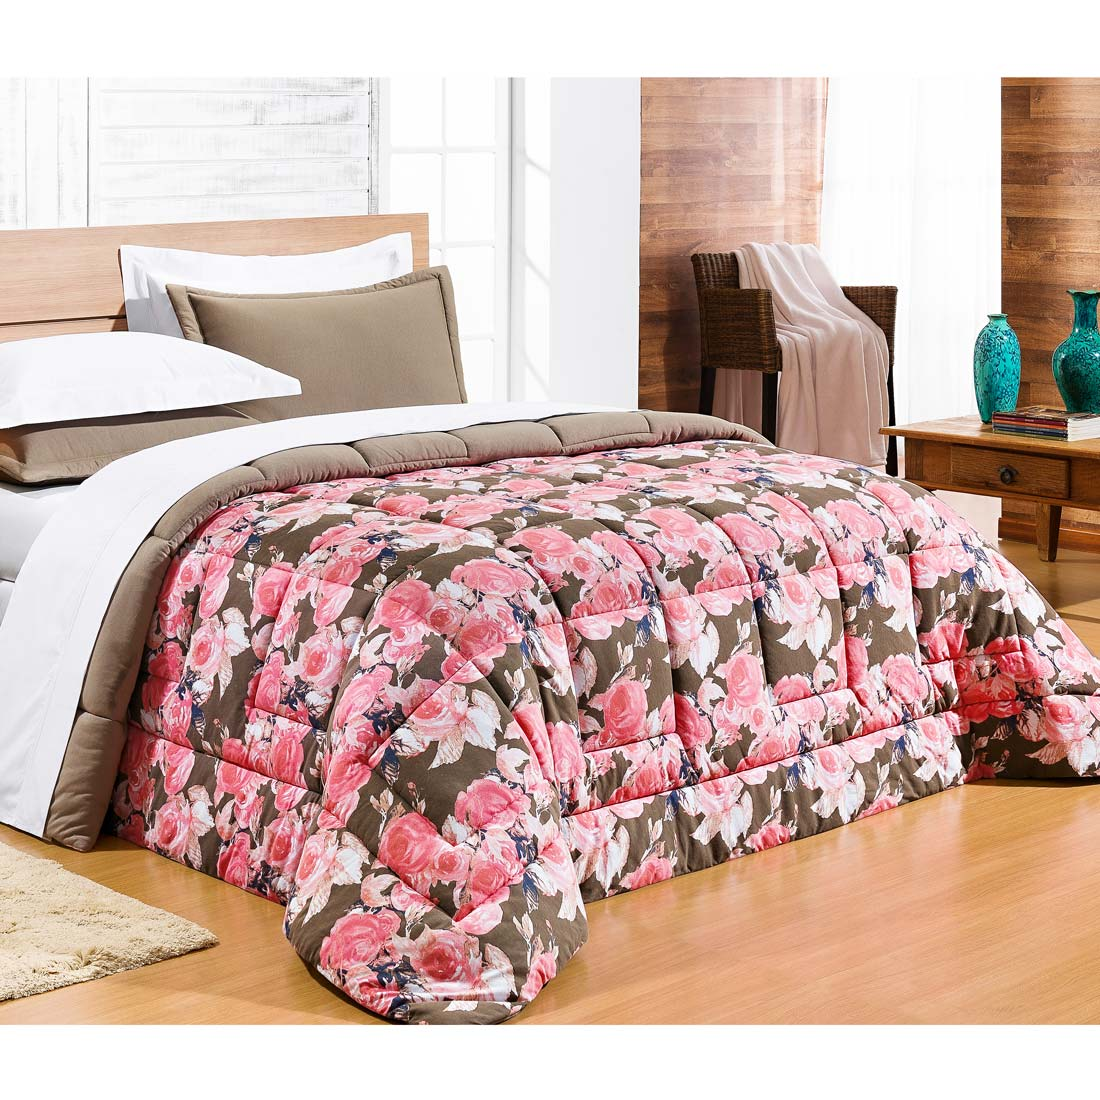 Edredom Casal King Safari 01 Peça Estampado DF Malha Penteada - Rosa Floral